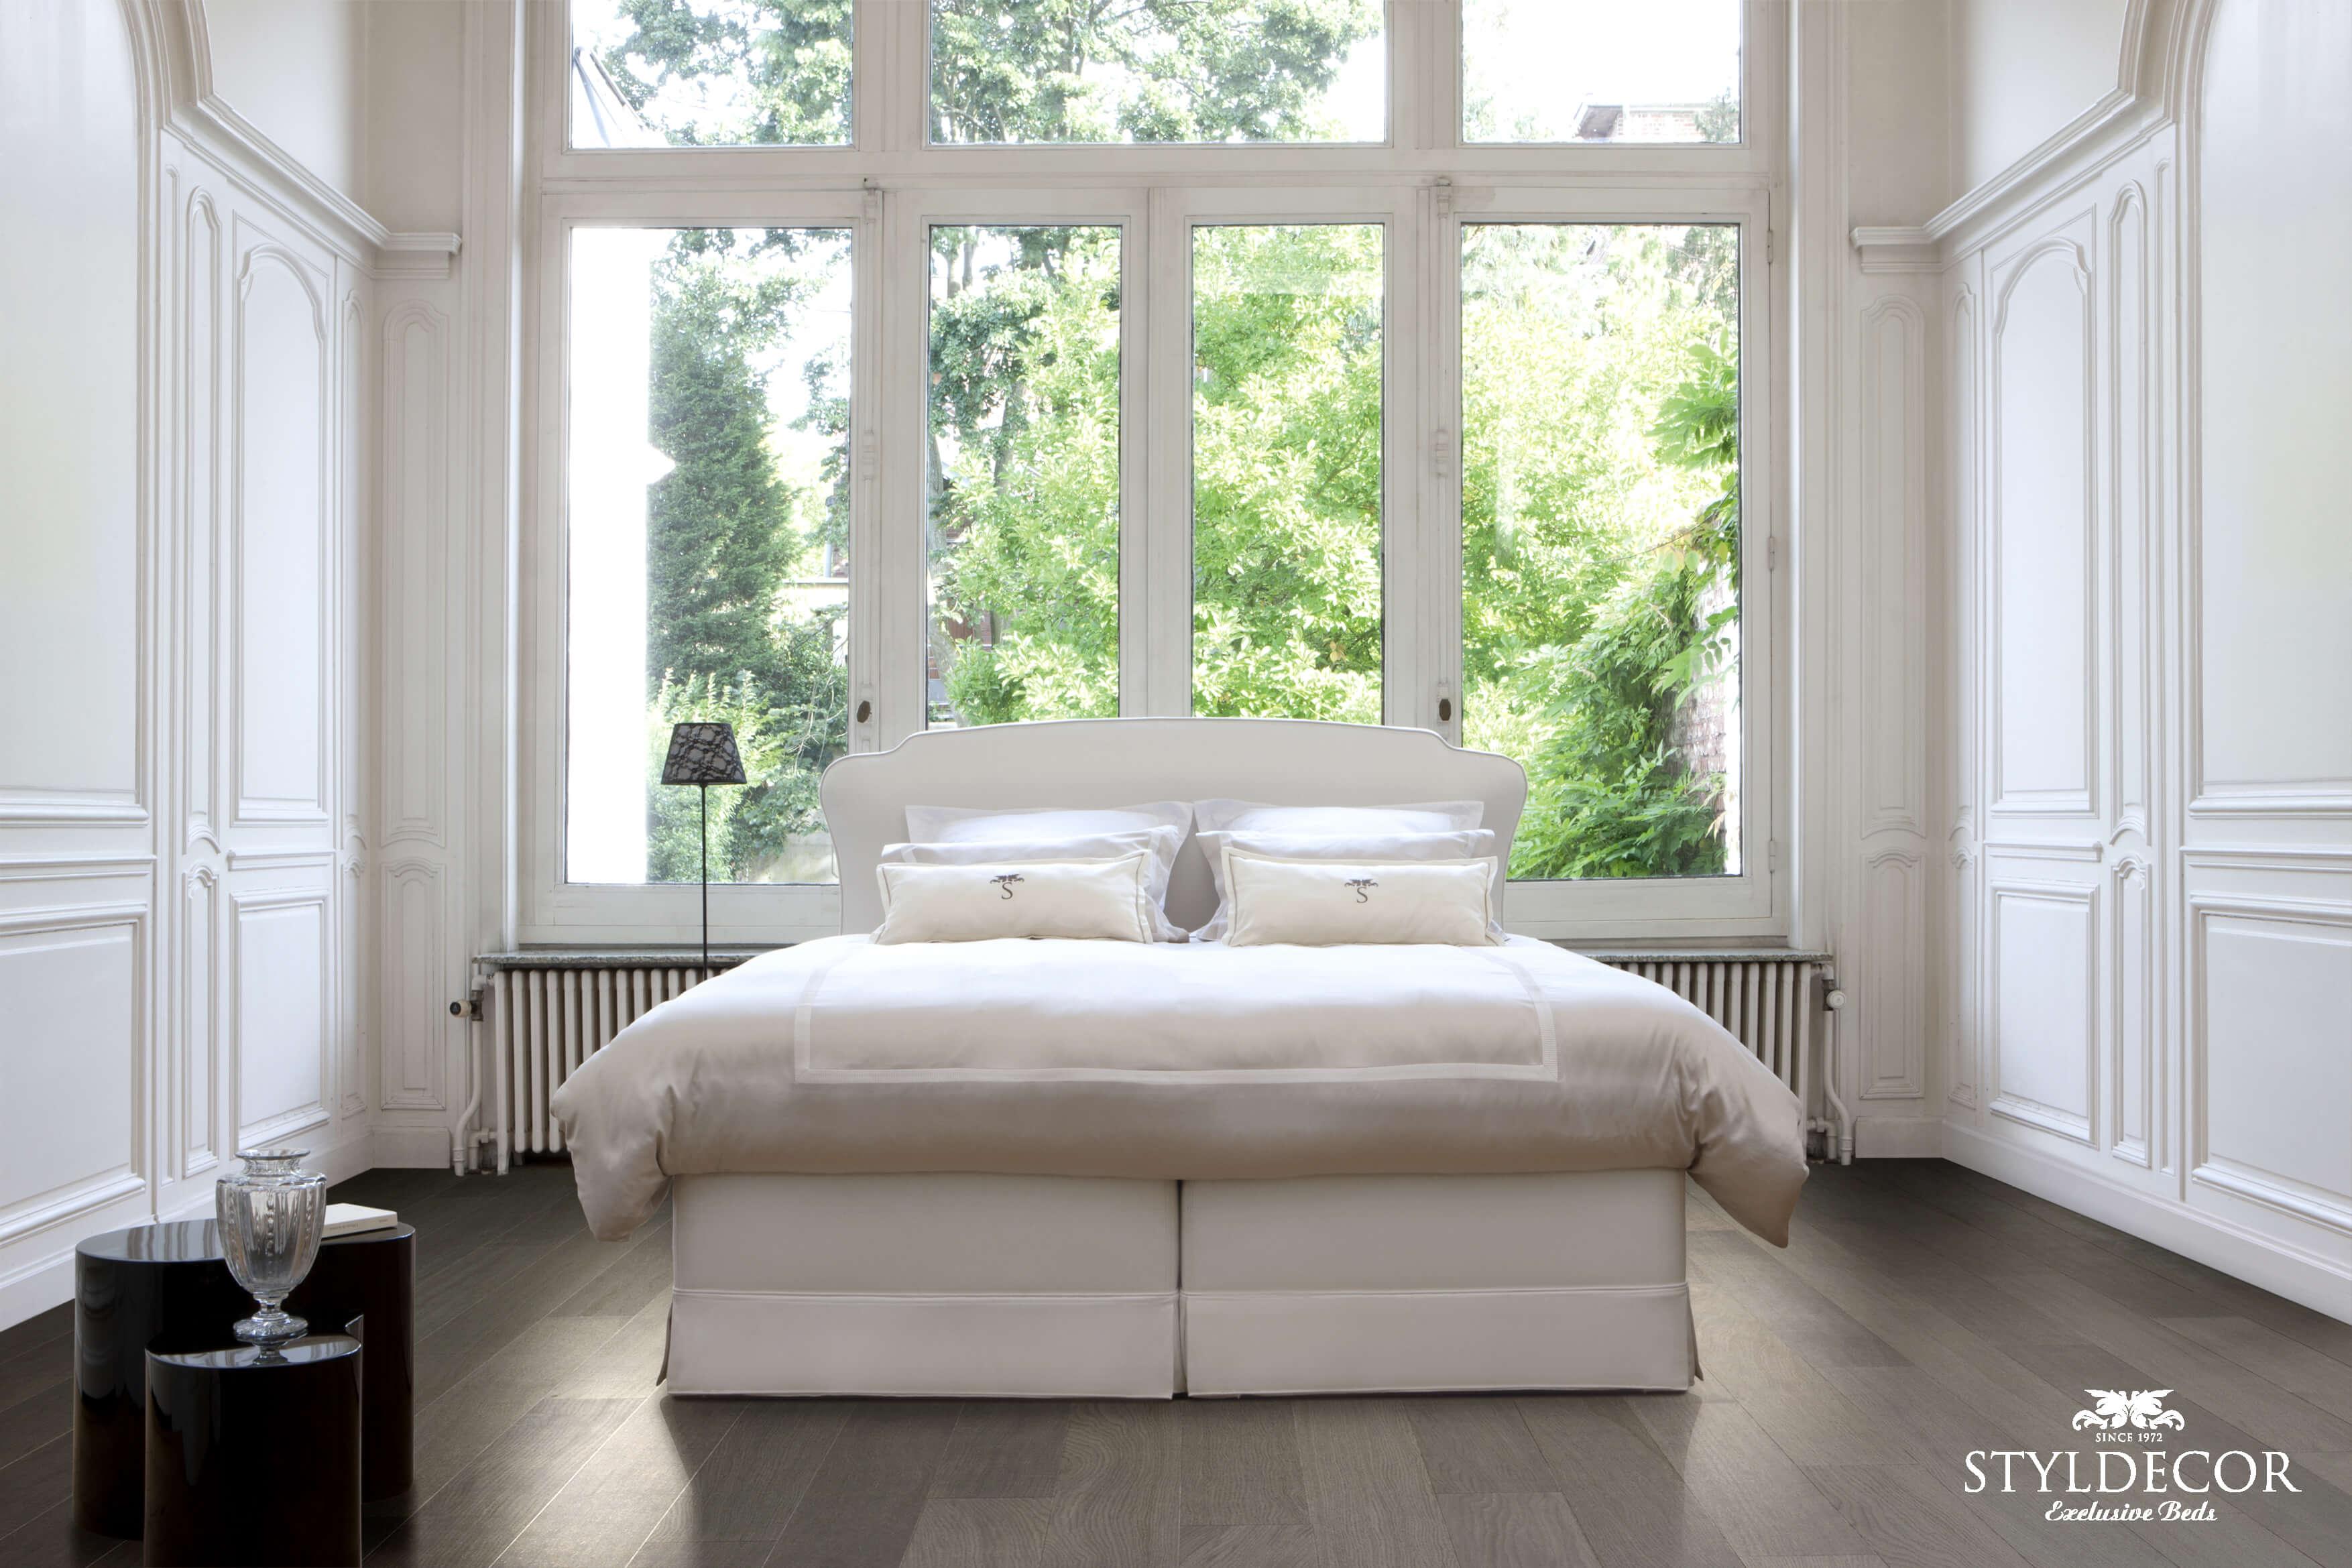 STYLDECOR Handmade Luxury Beds